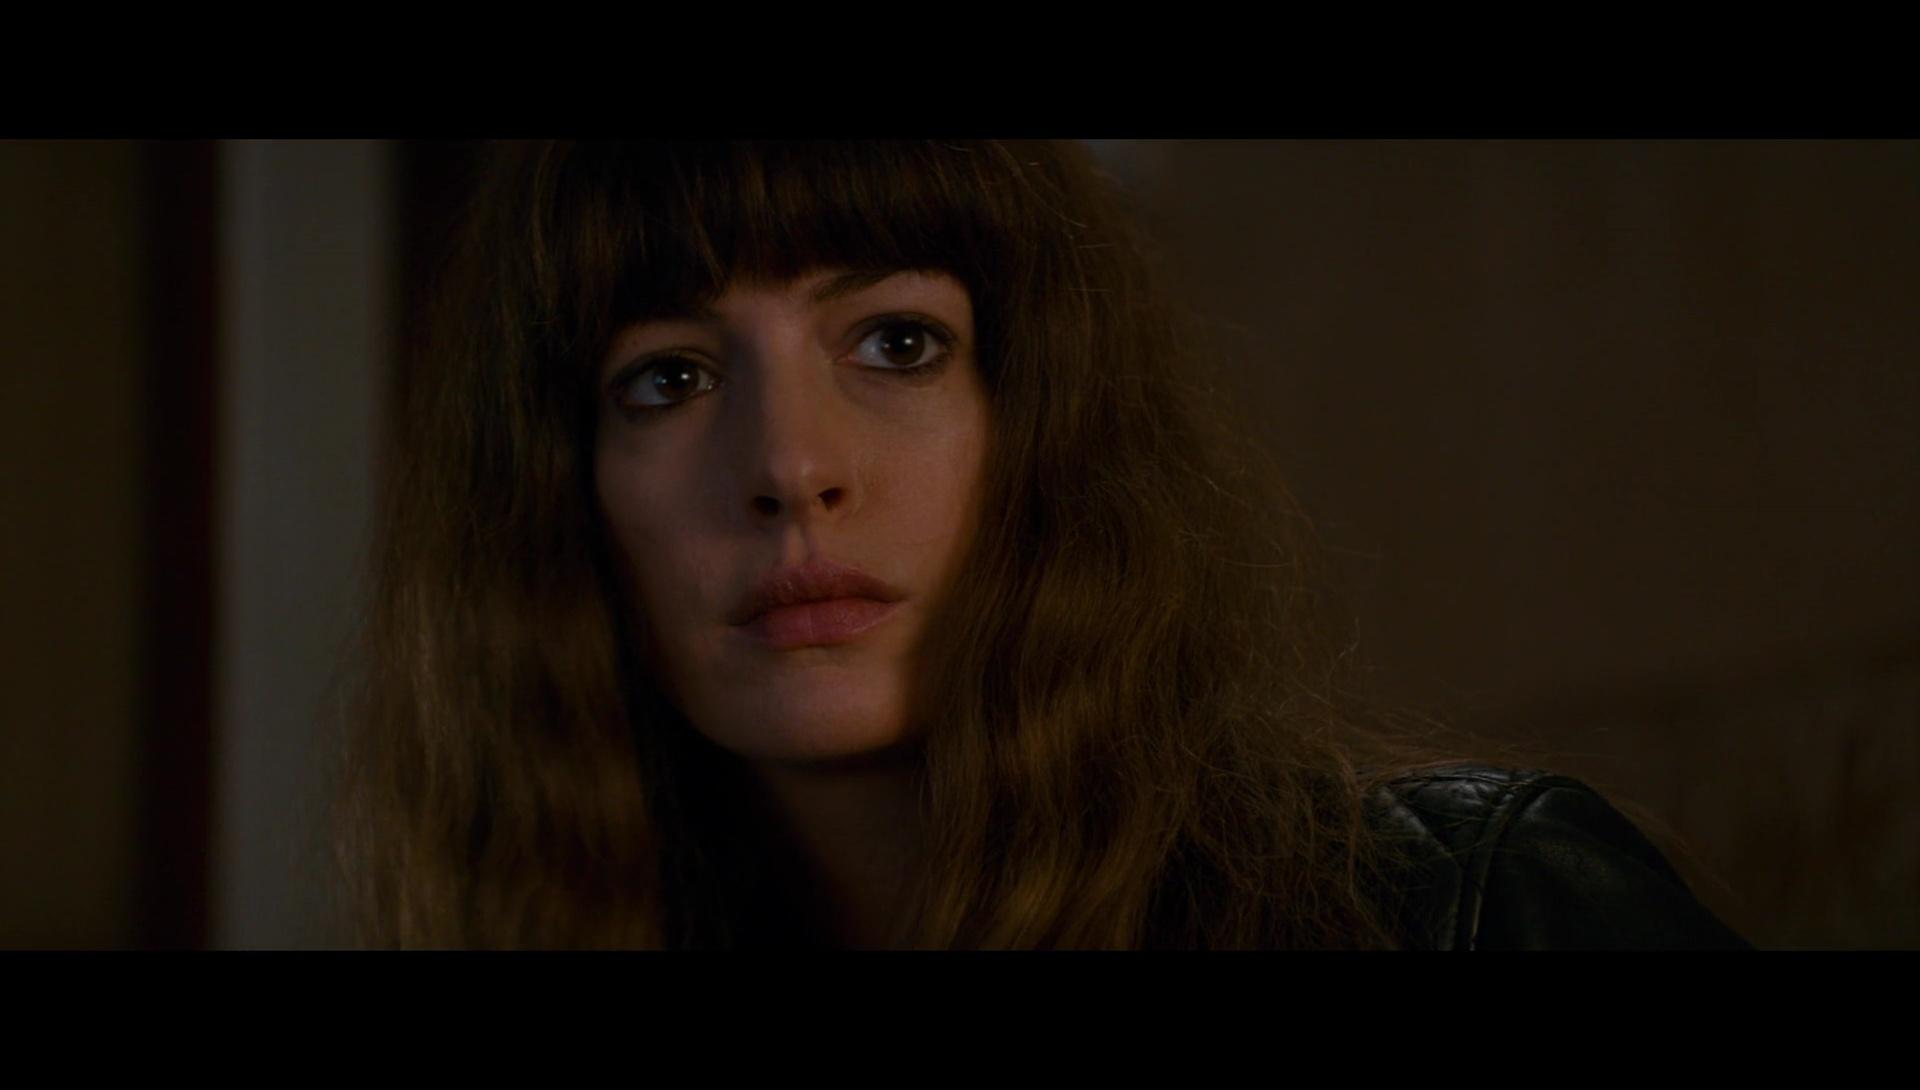 Ella Es Un Monstruo 1080p Lat-Cast-Ing 5.1 (2016)